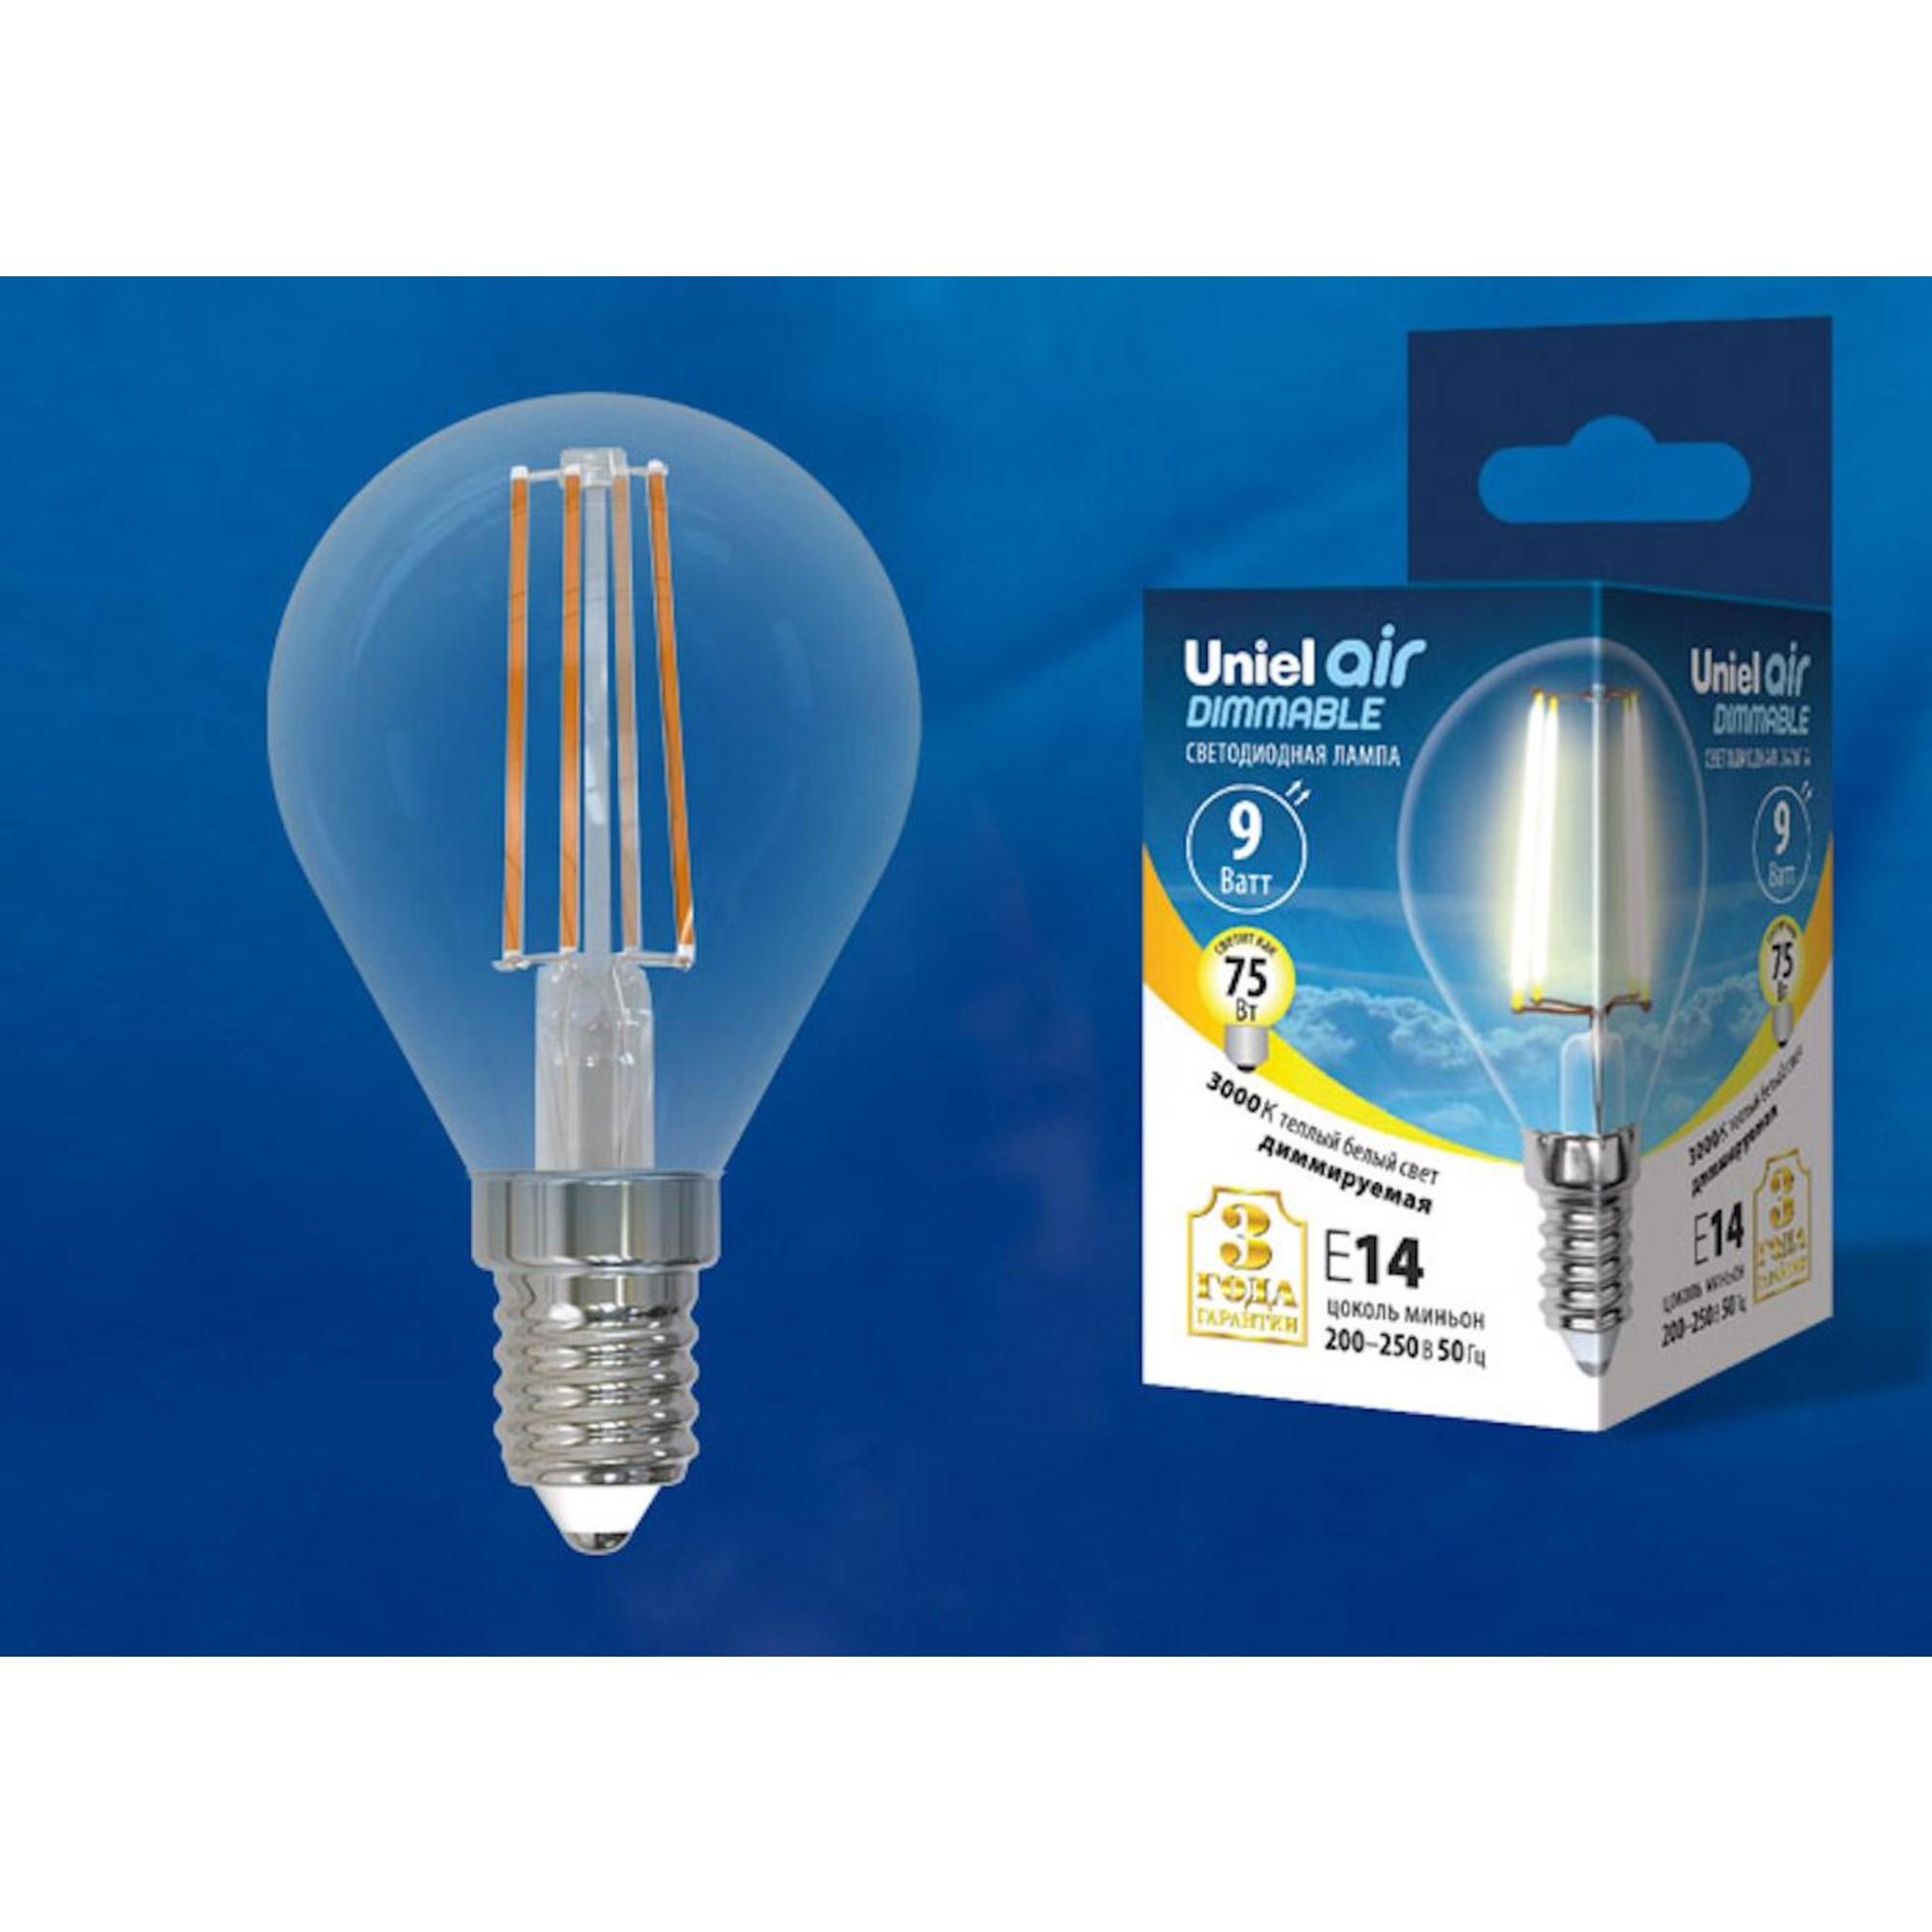 Светодиодная лампочка Uniel LED-G45-9W AIR DIMMABLE UL-00005191